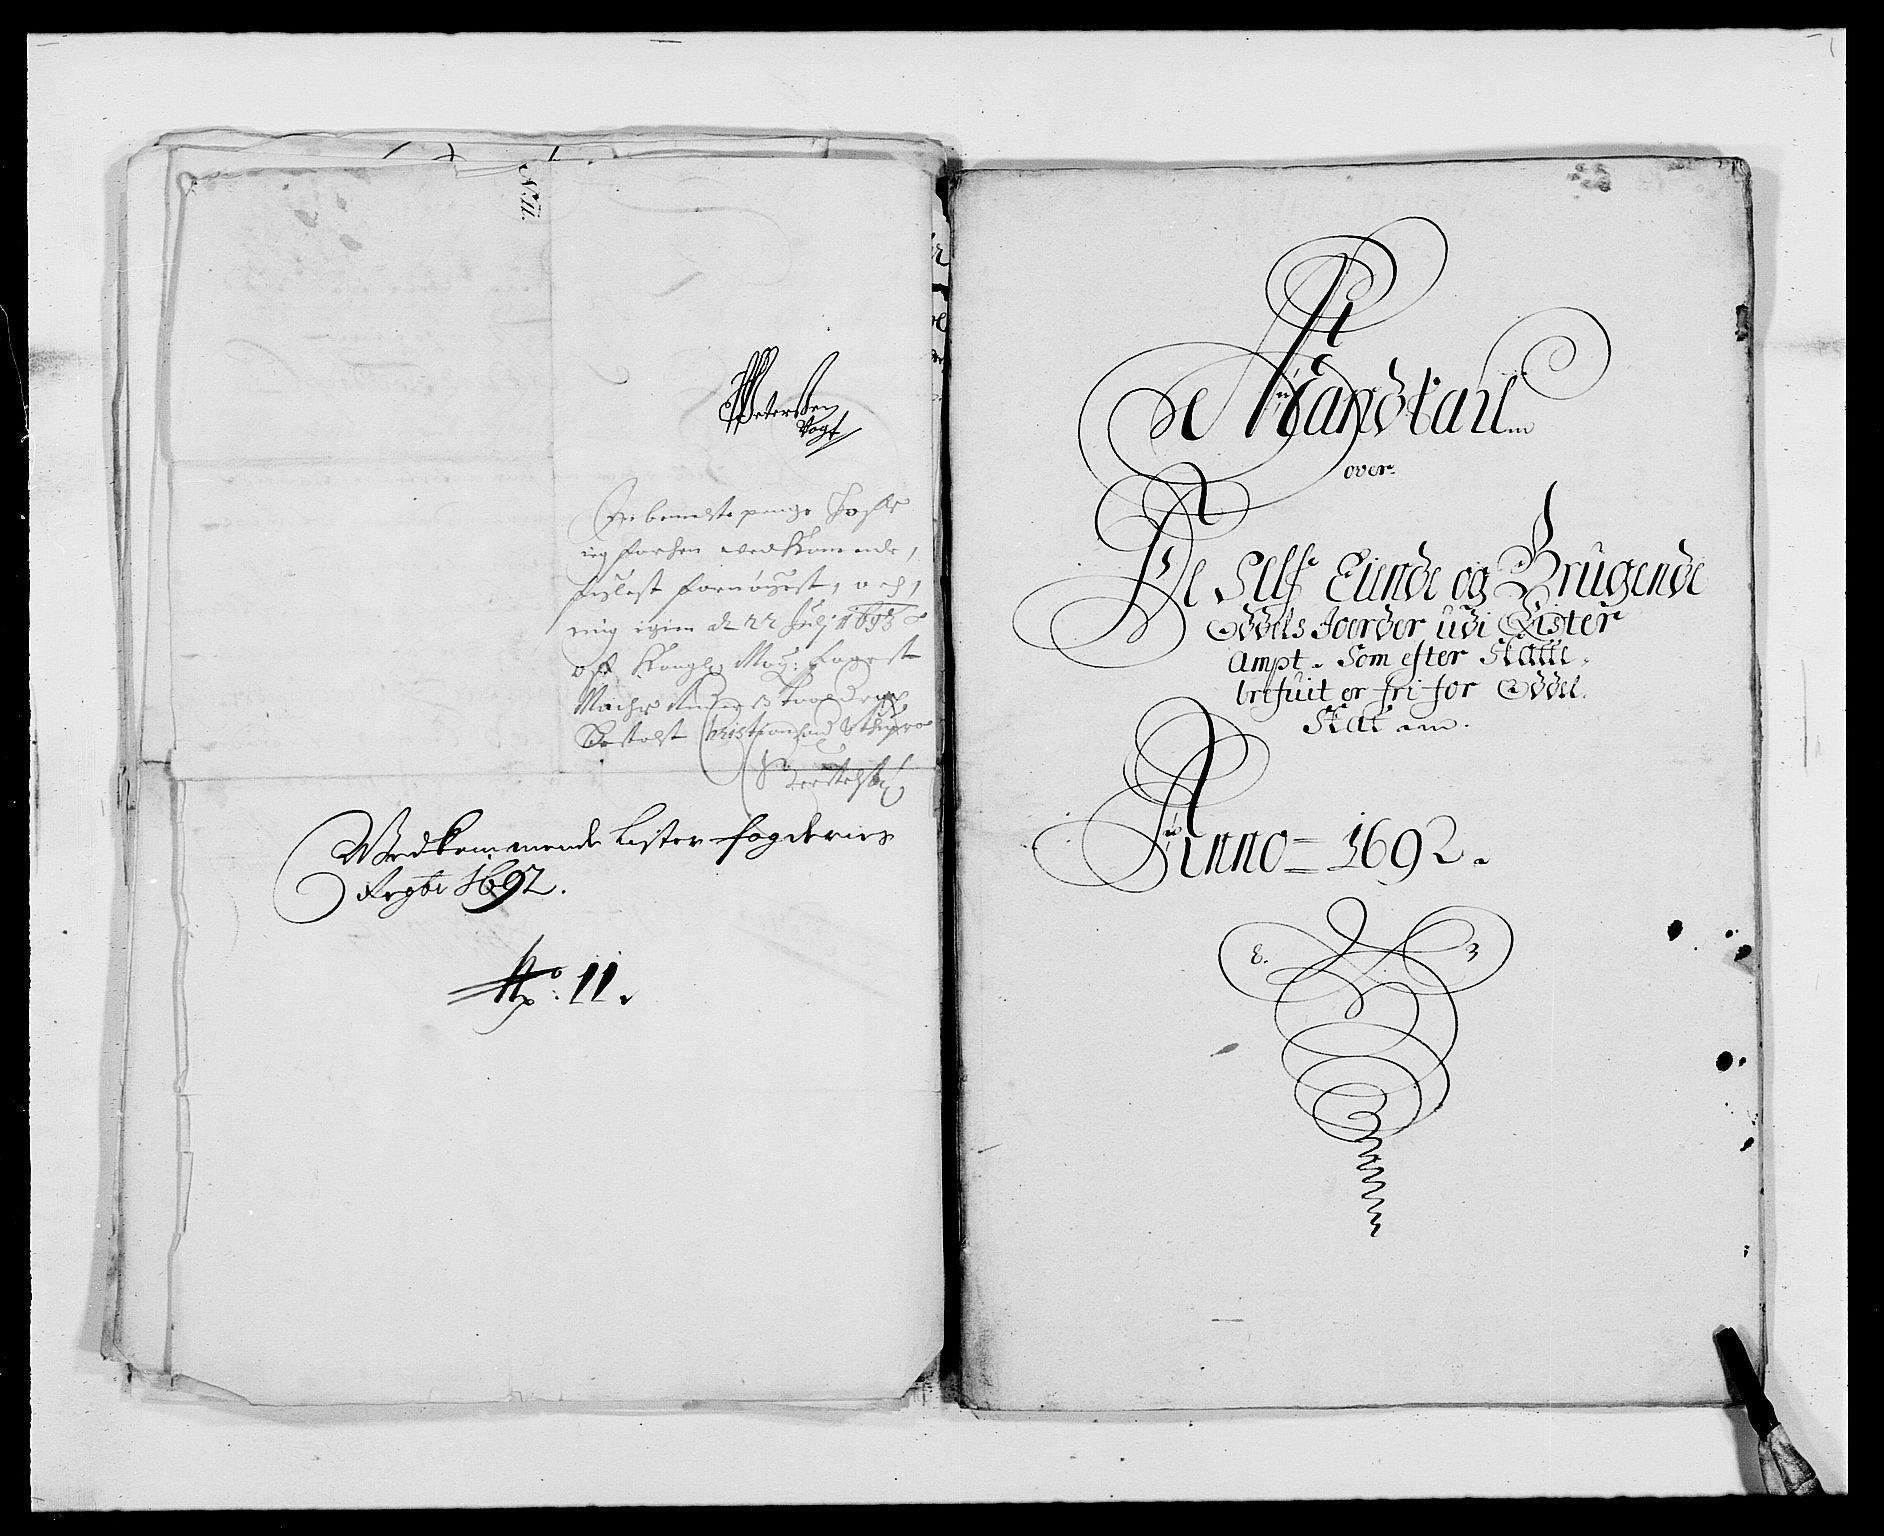 RA, Rentekammeret inntil 1814, Reviderte regnskaper, Fogderegnskap, R41/L2536: Fogderegnskap Lista, 1690-1693, s. 249